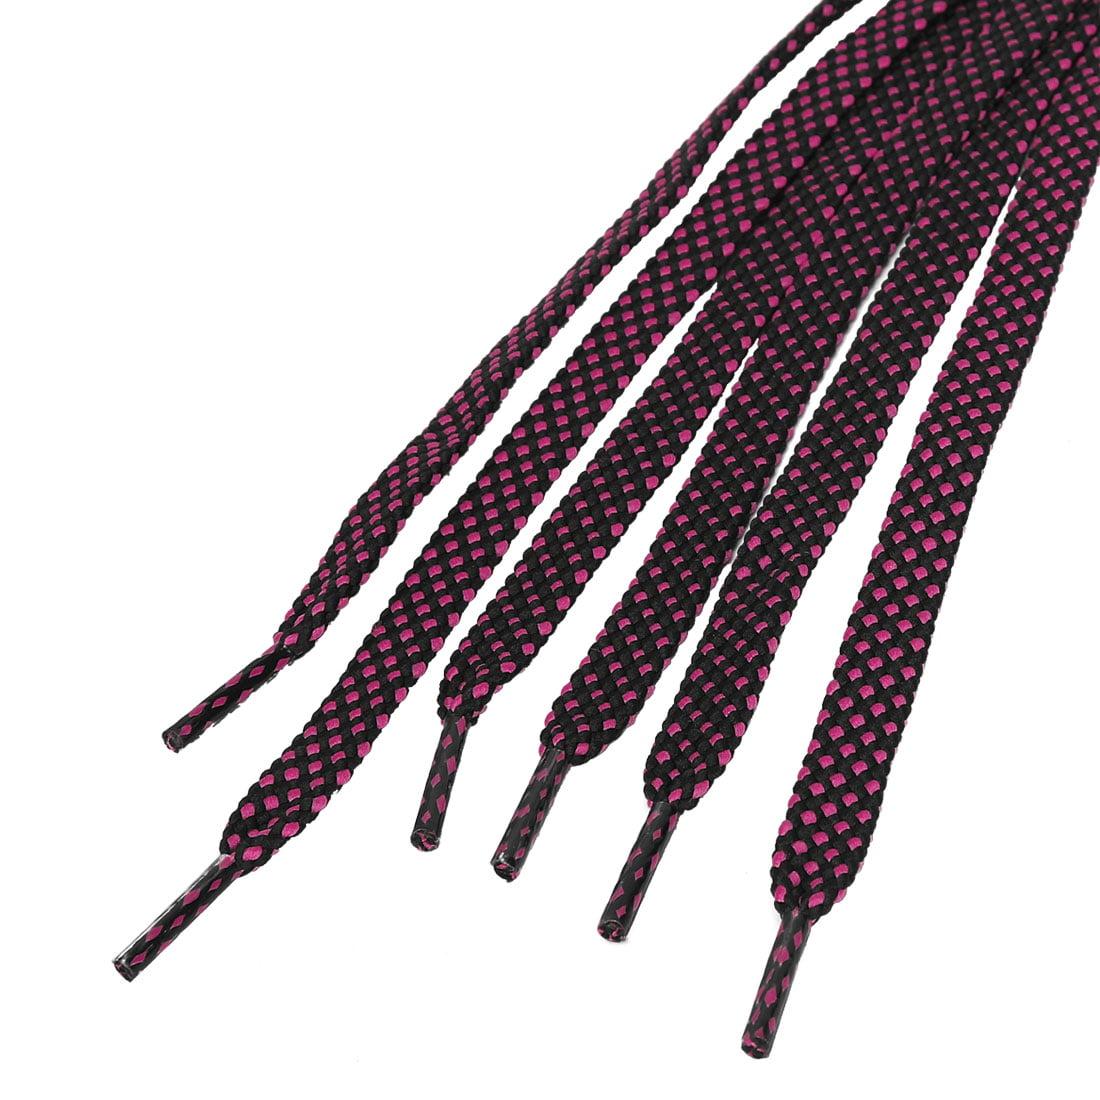 "3 Pairs Double Layer Flat Shoelaces Sneakers Sports Black Fuchsia 140 cm/55"" - image 1 de 4"